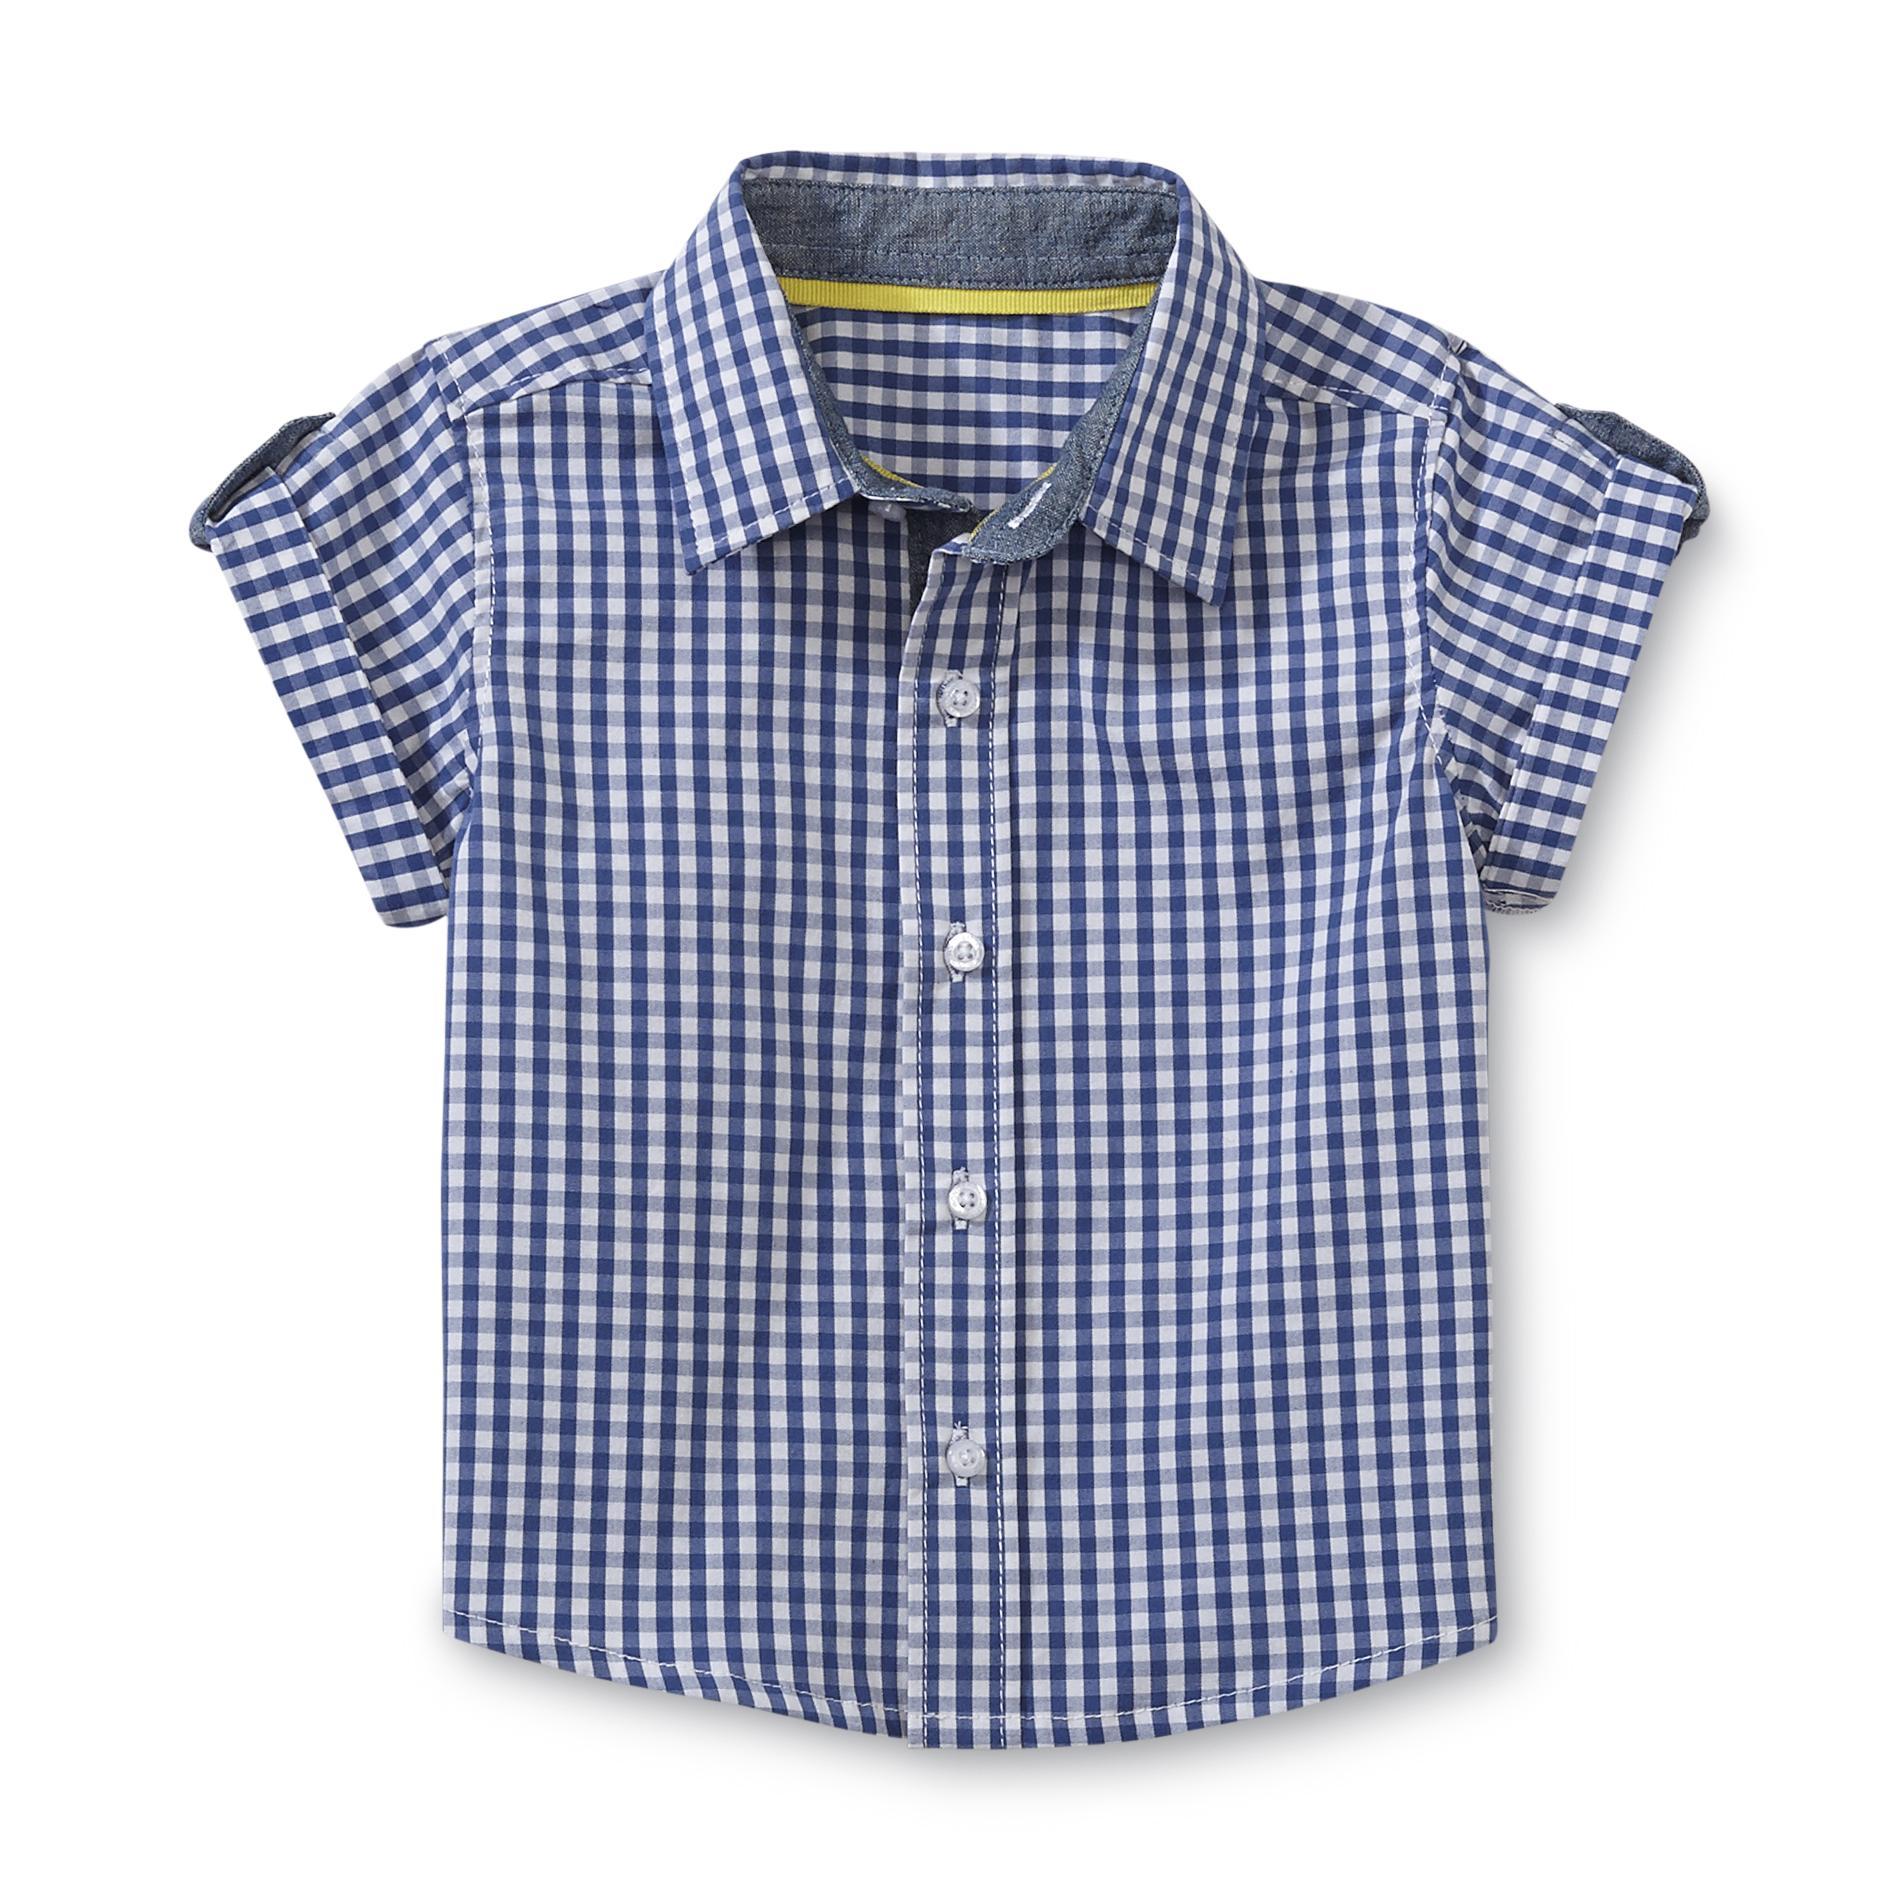 Newborn & Infant Boy's Short-Sleeve Shirt - Gingham